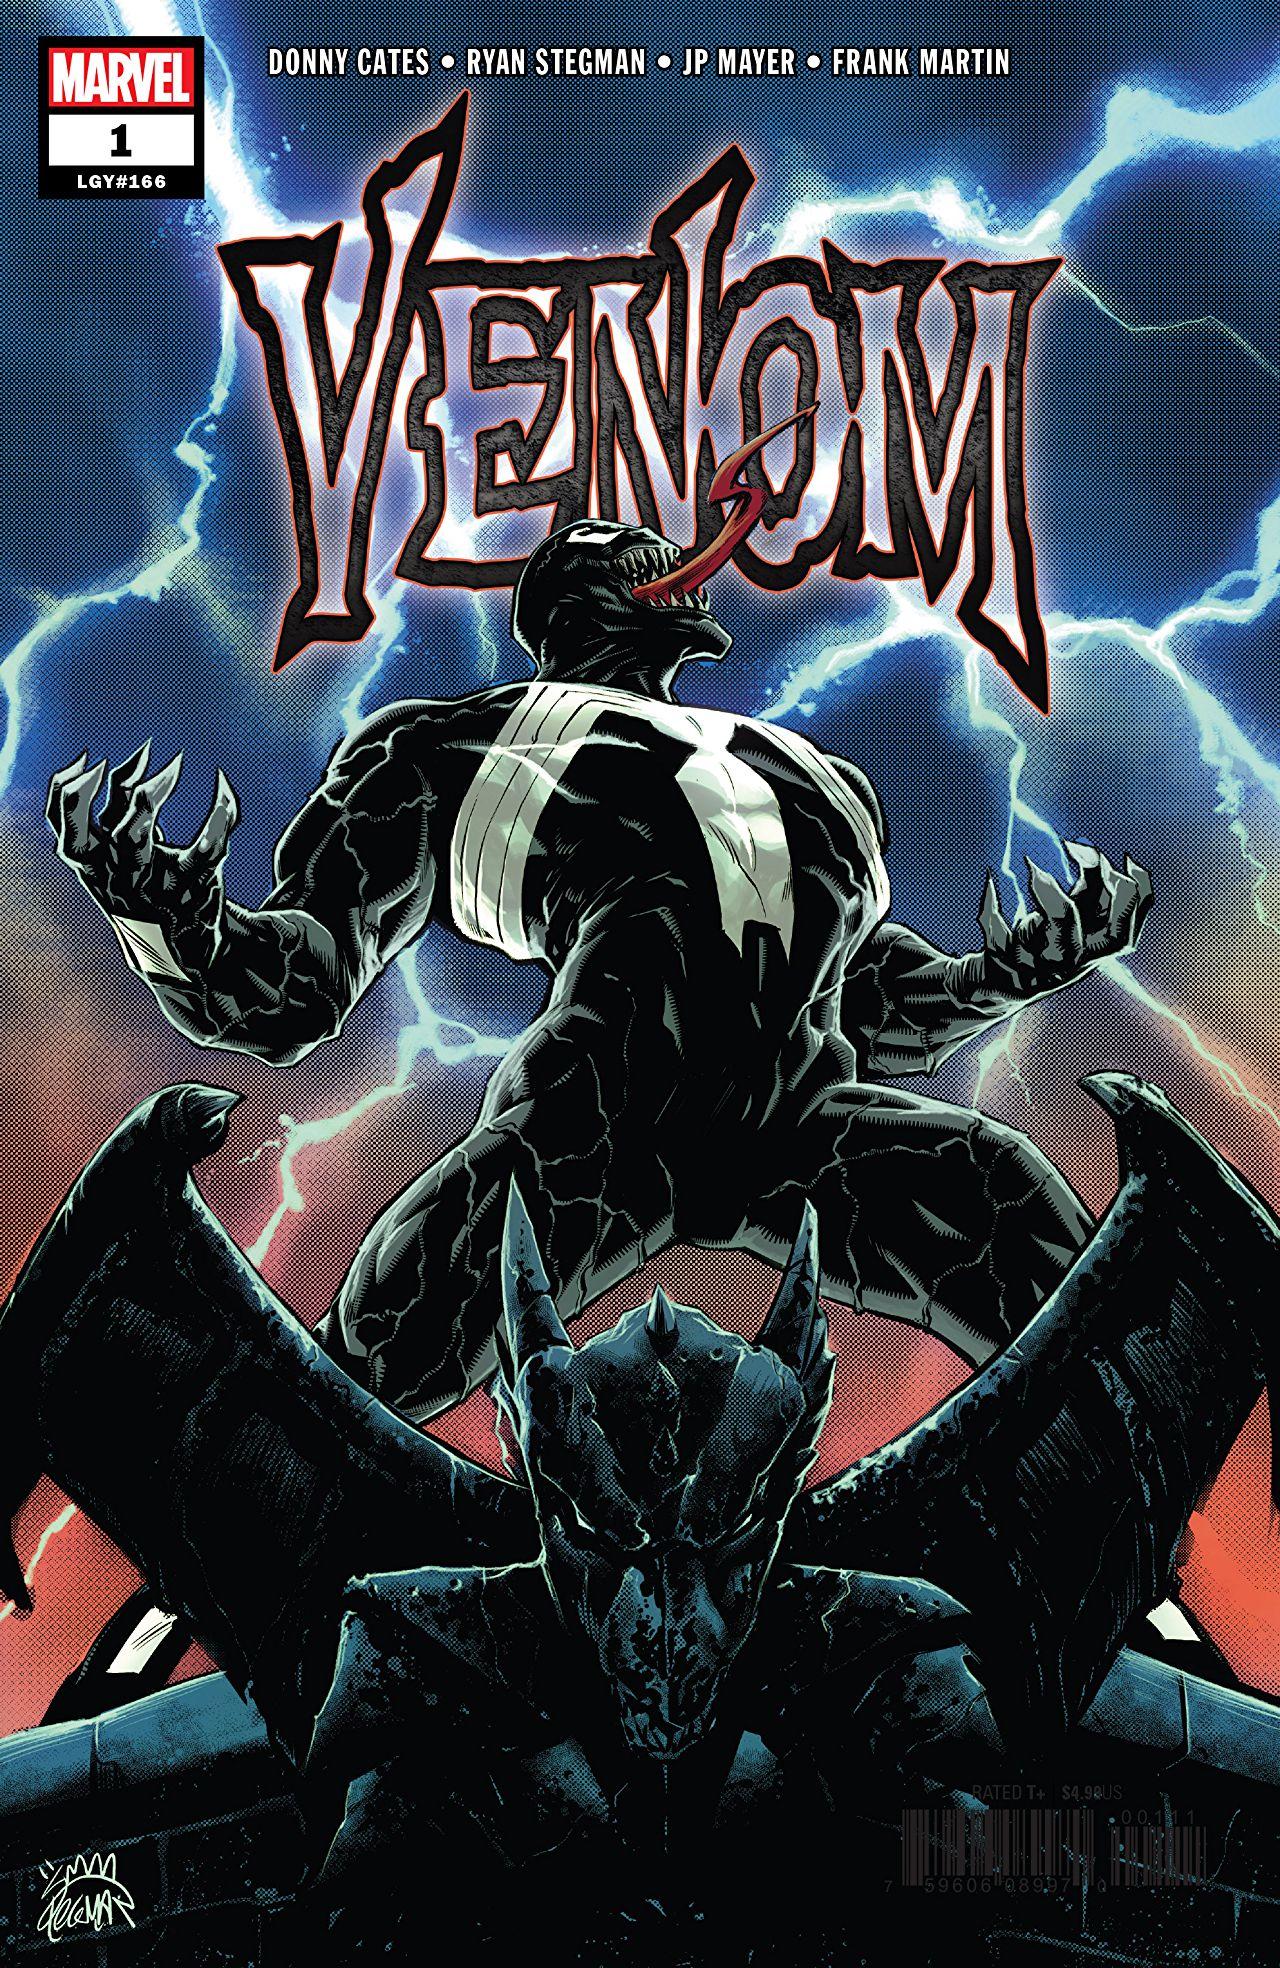 Venom (2018) #1 Cover